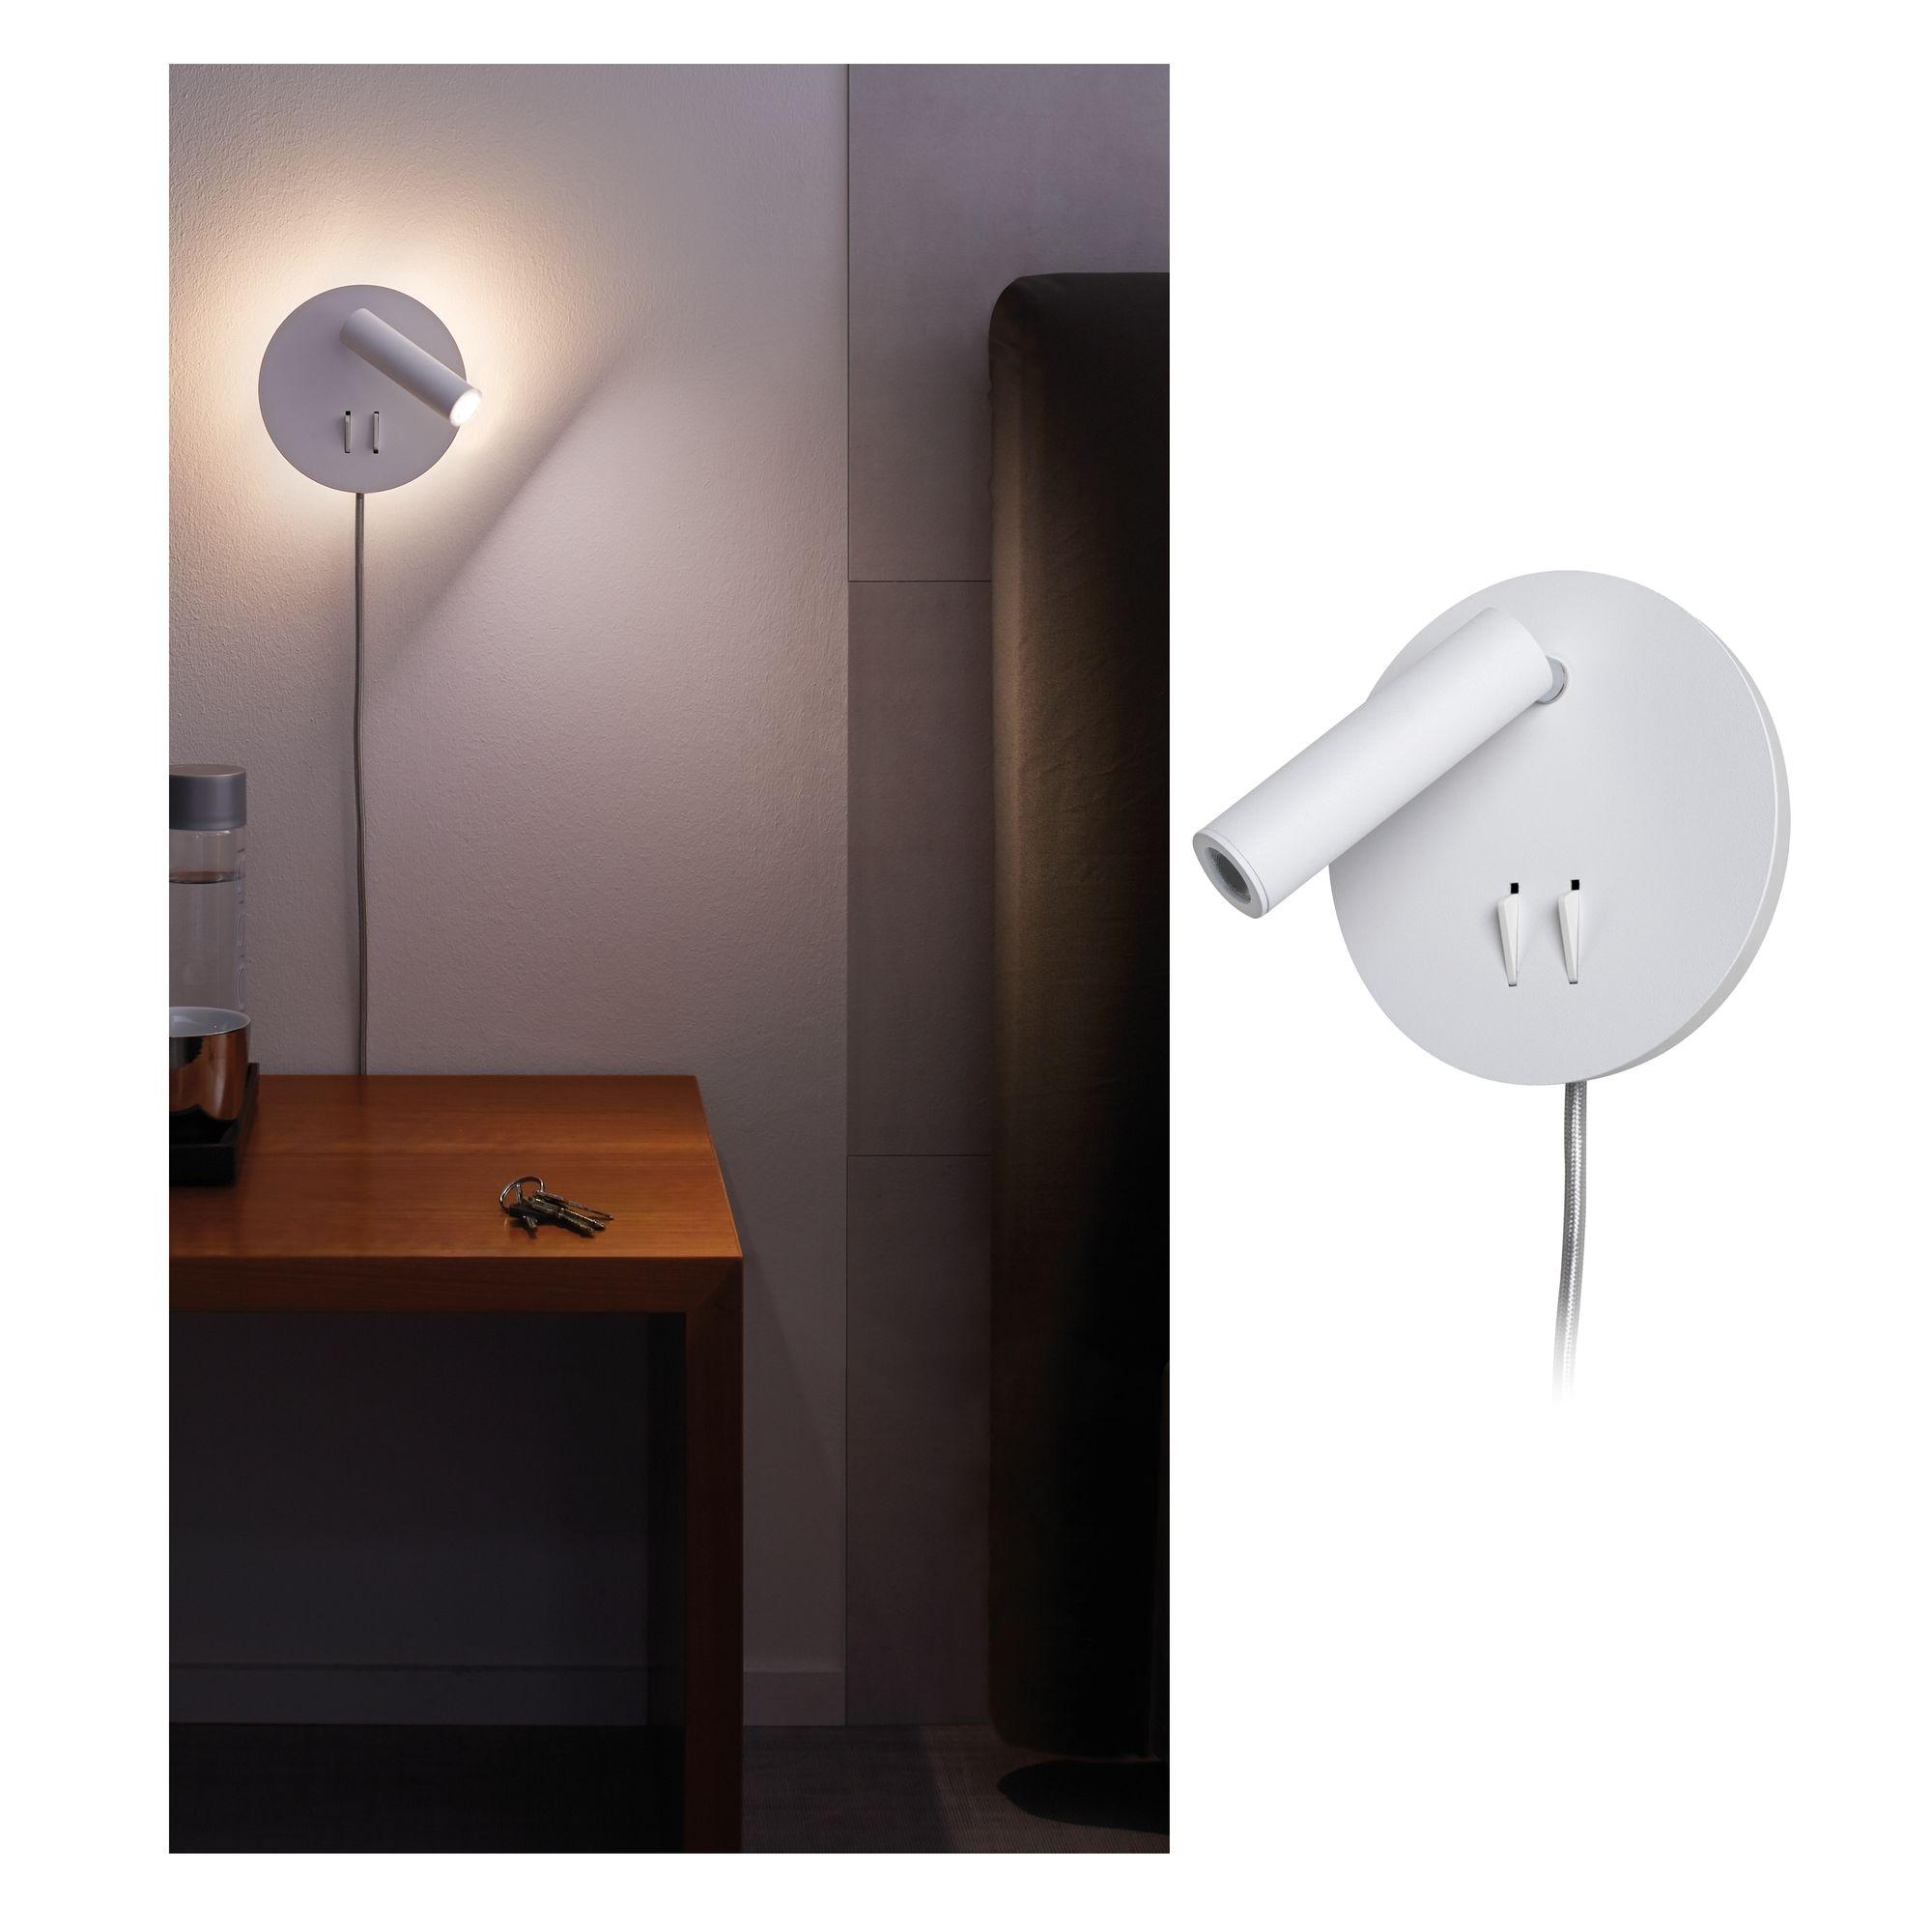 Paulmann LED Wandleuchte Tabari 4W Weiß/Chrom, 1 St., Warmweiß